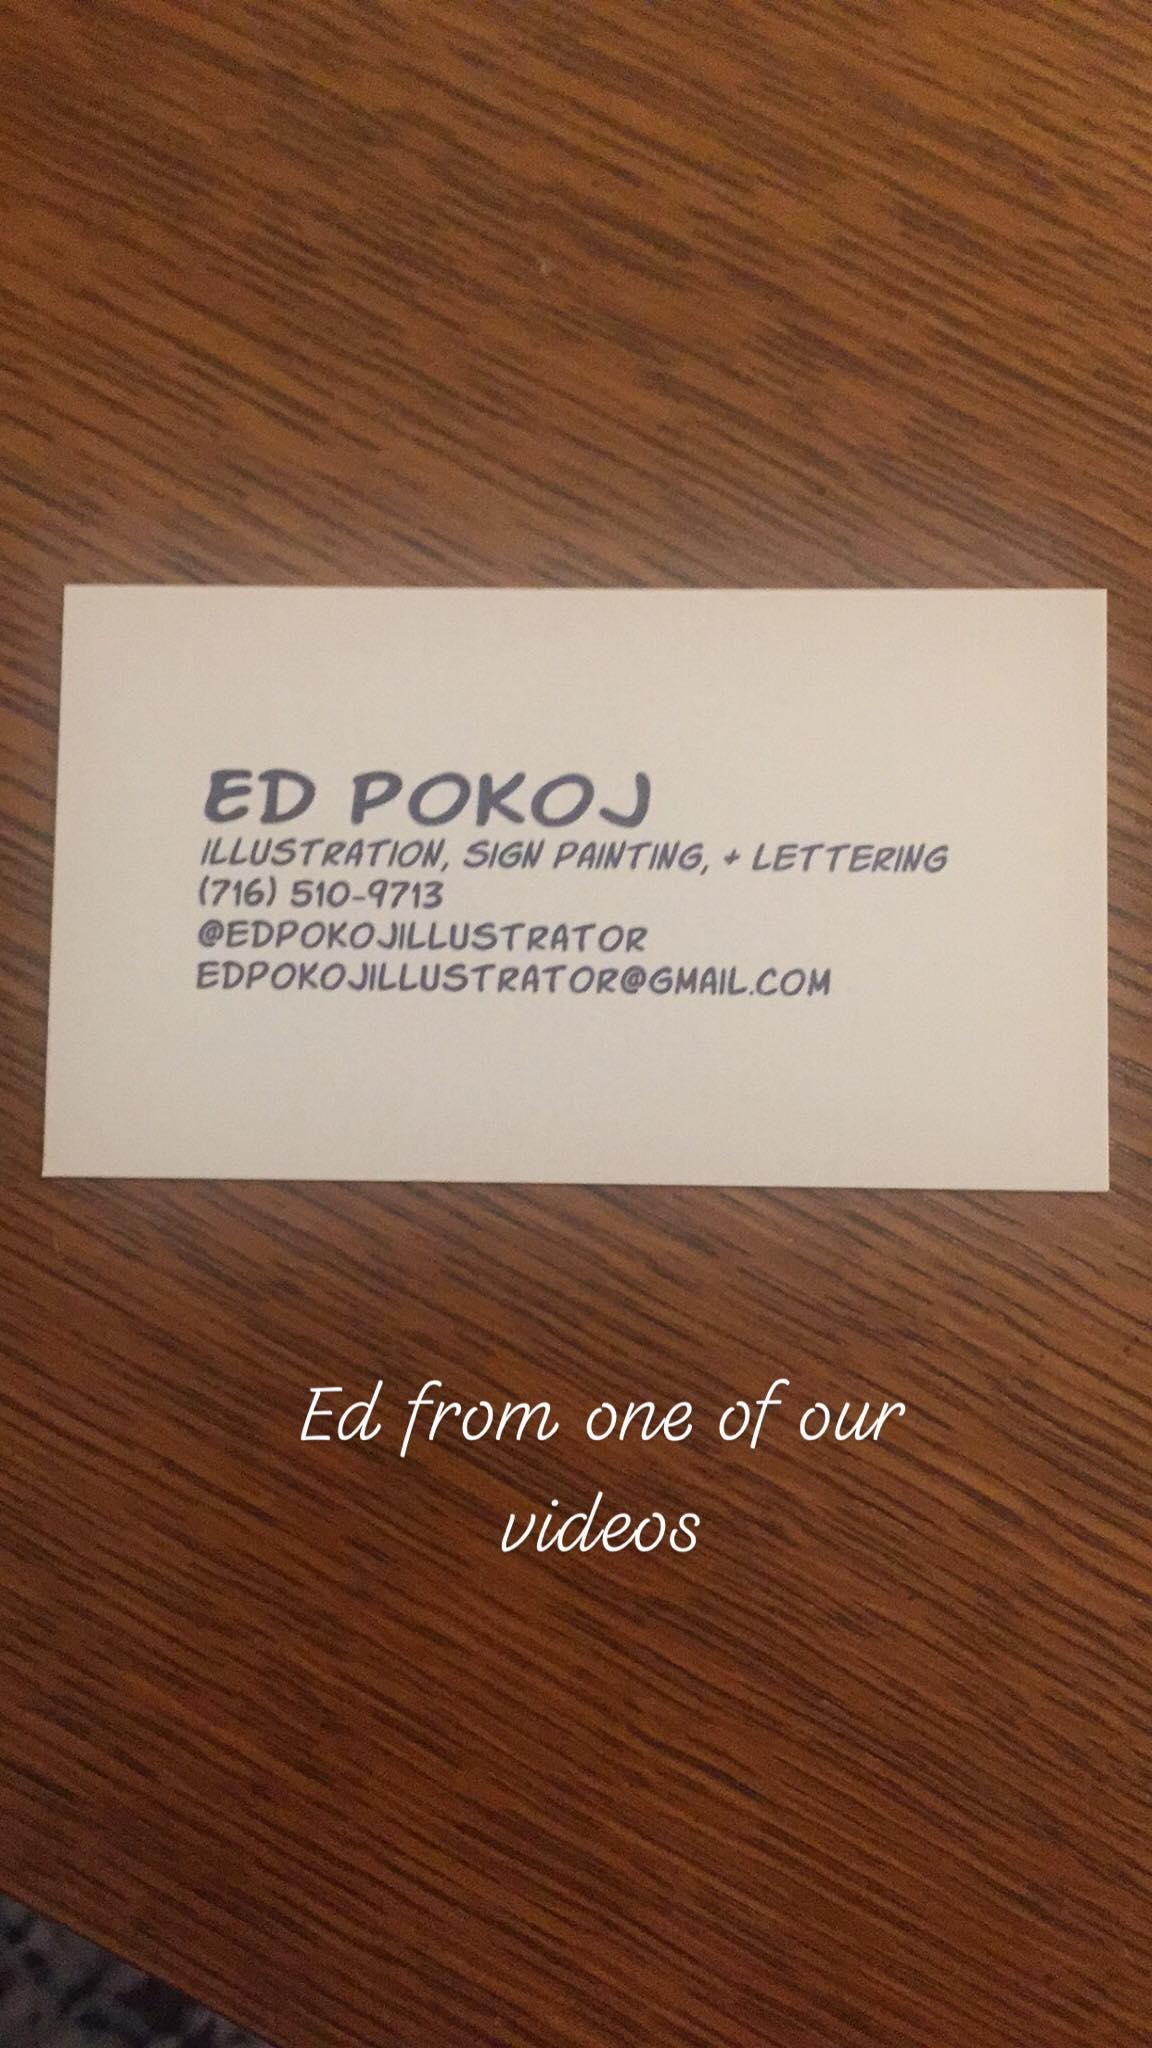 You can found Ed Pokoj on Instagram at  @edpokojillustrator .